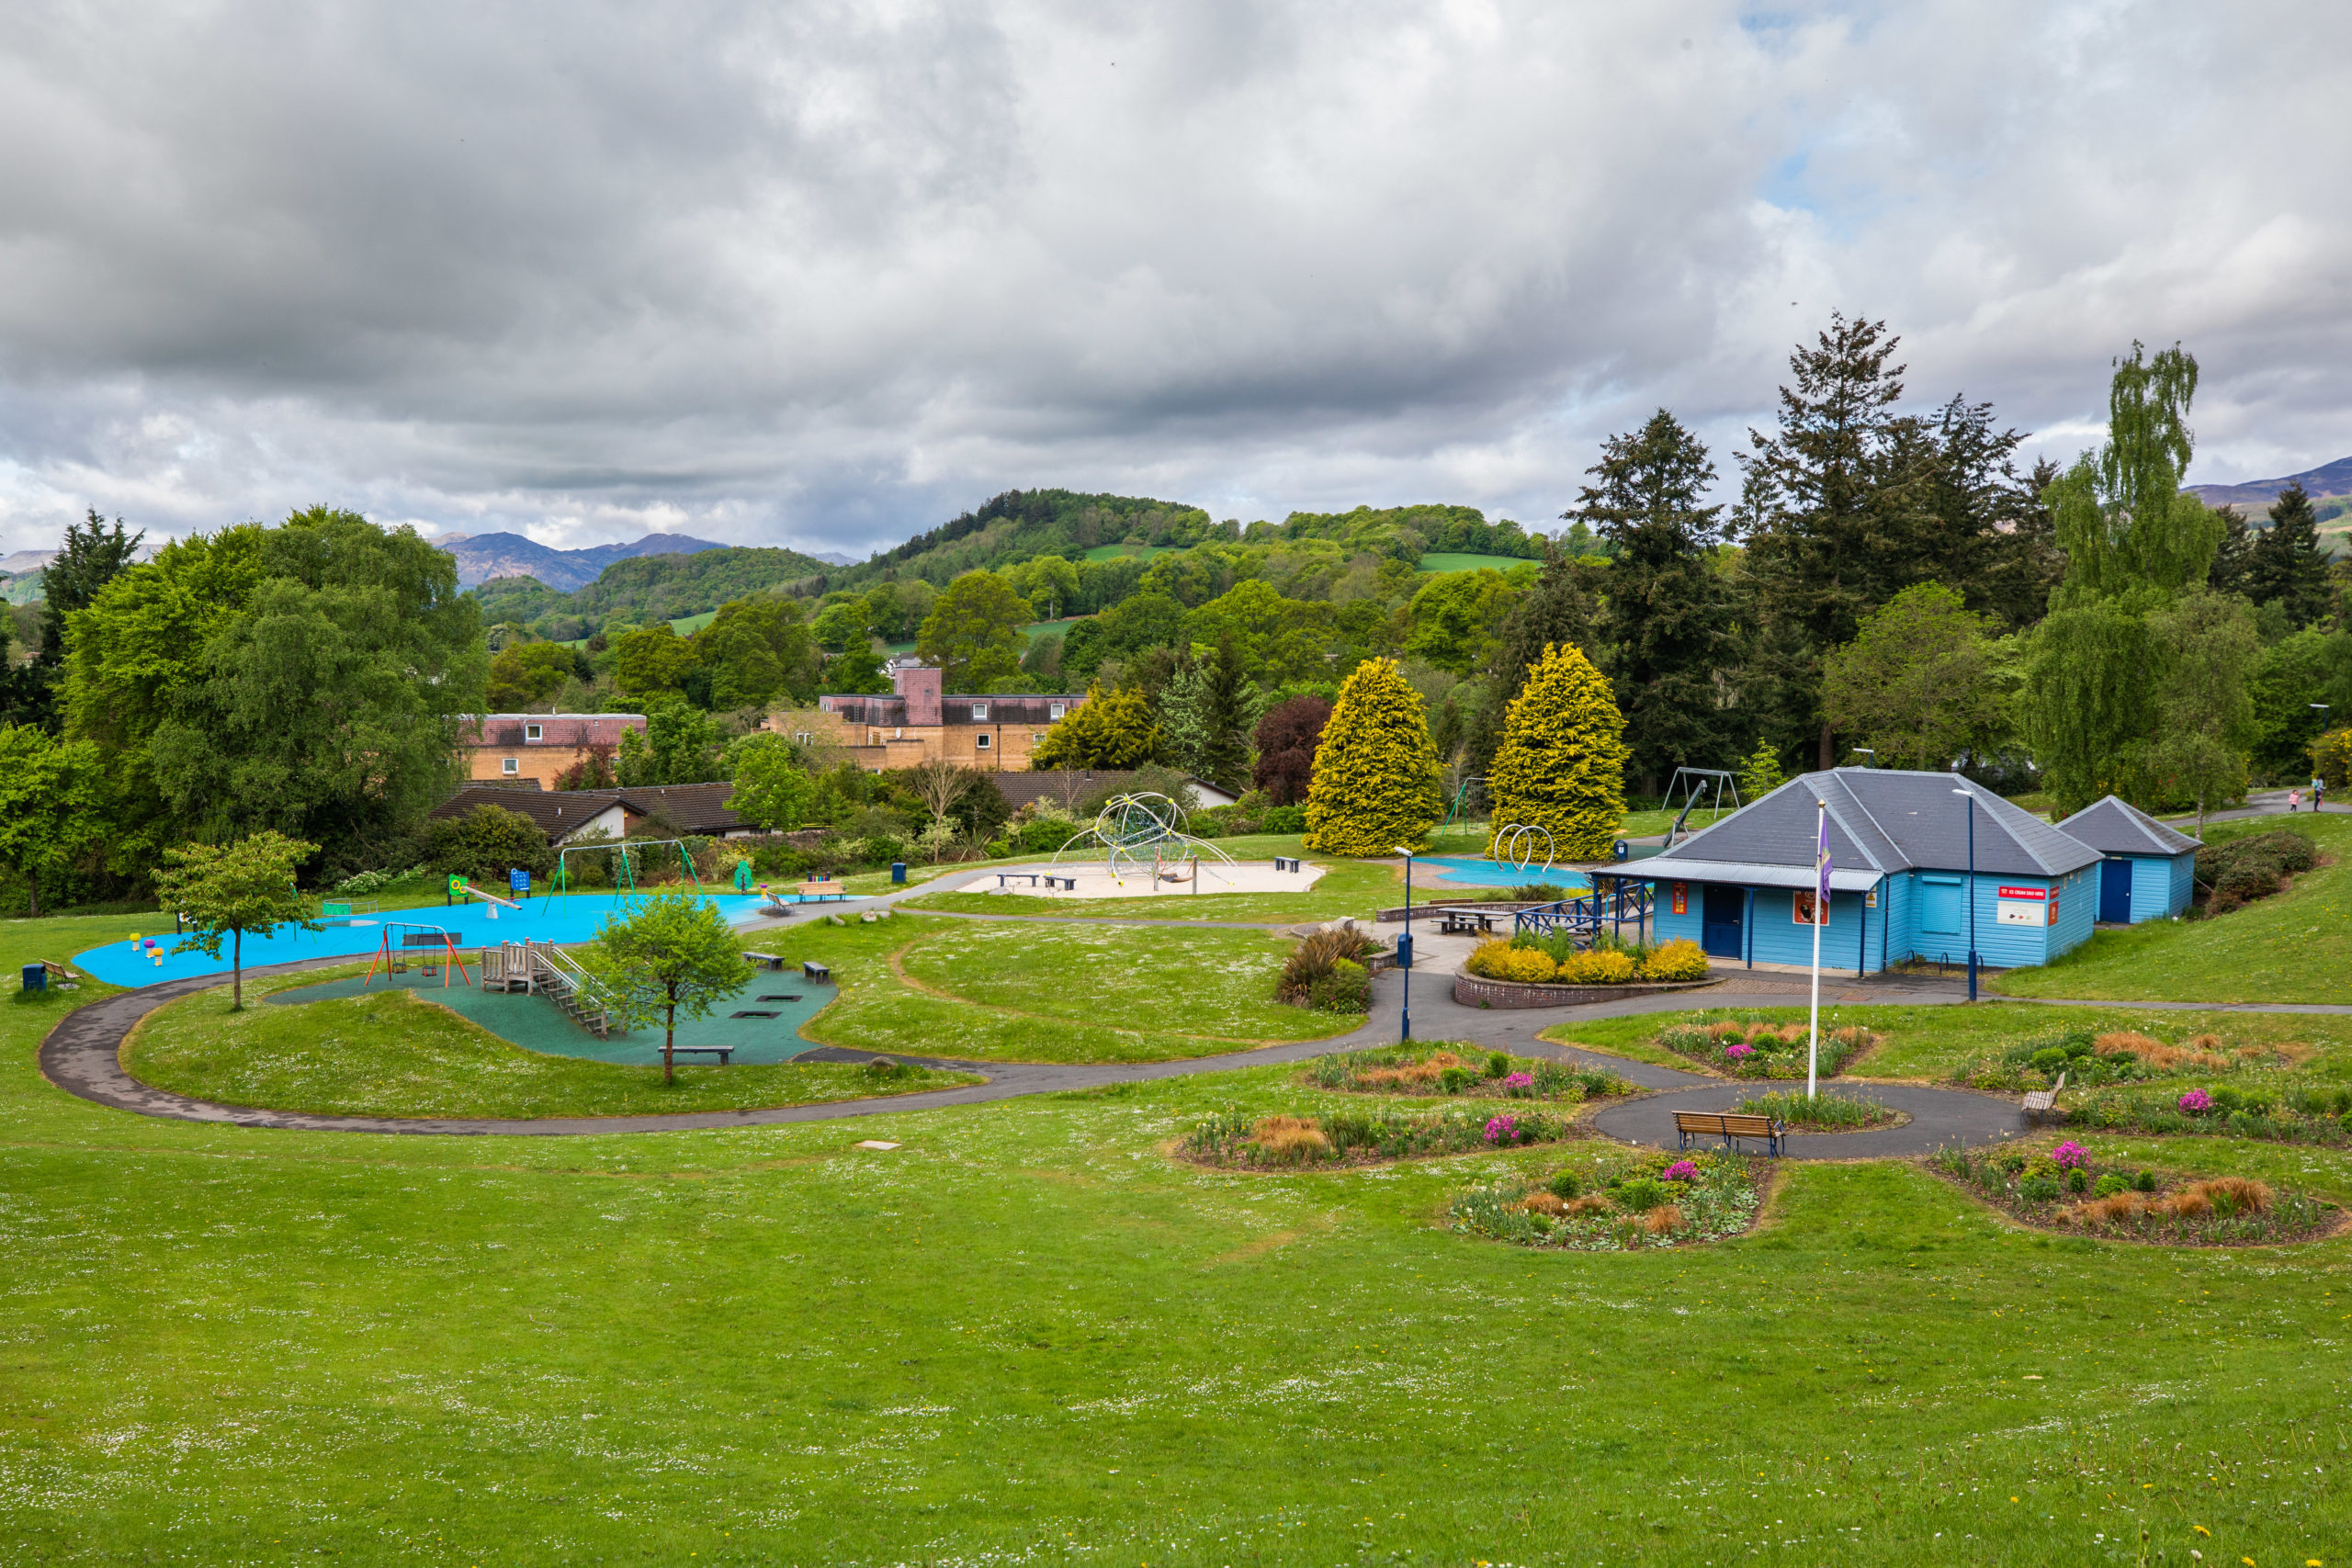 Macrosty Park in Crieff